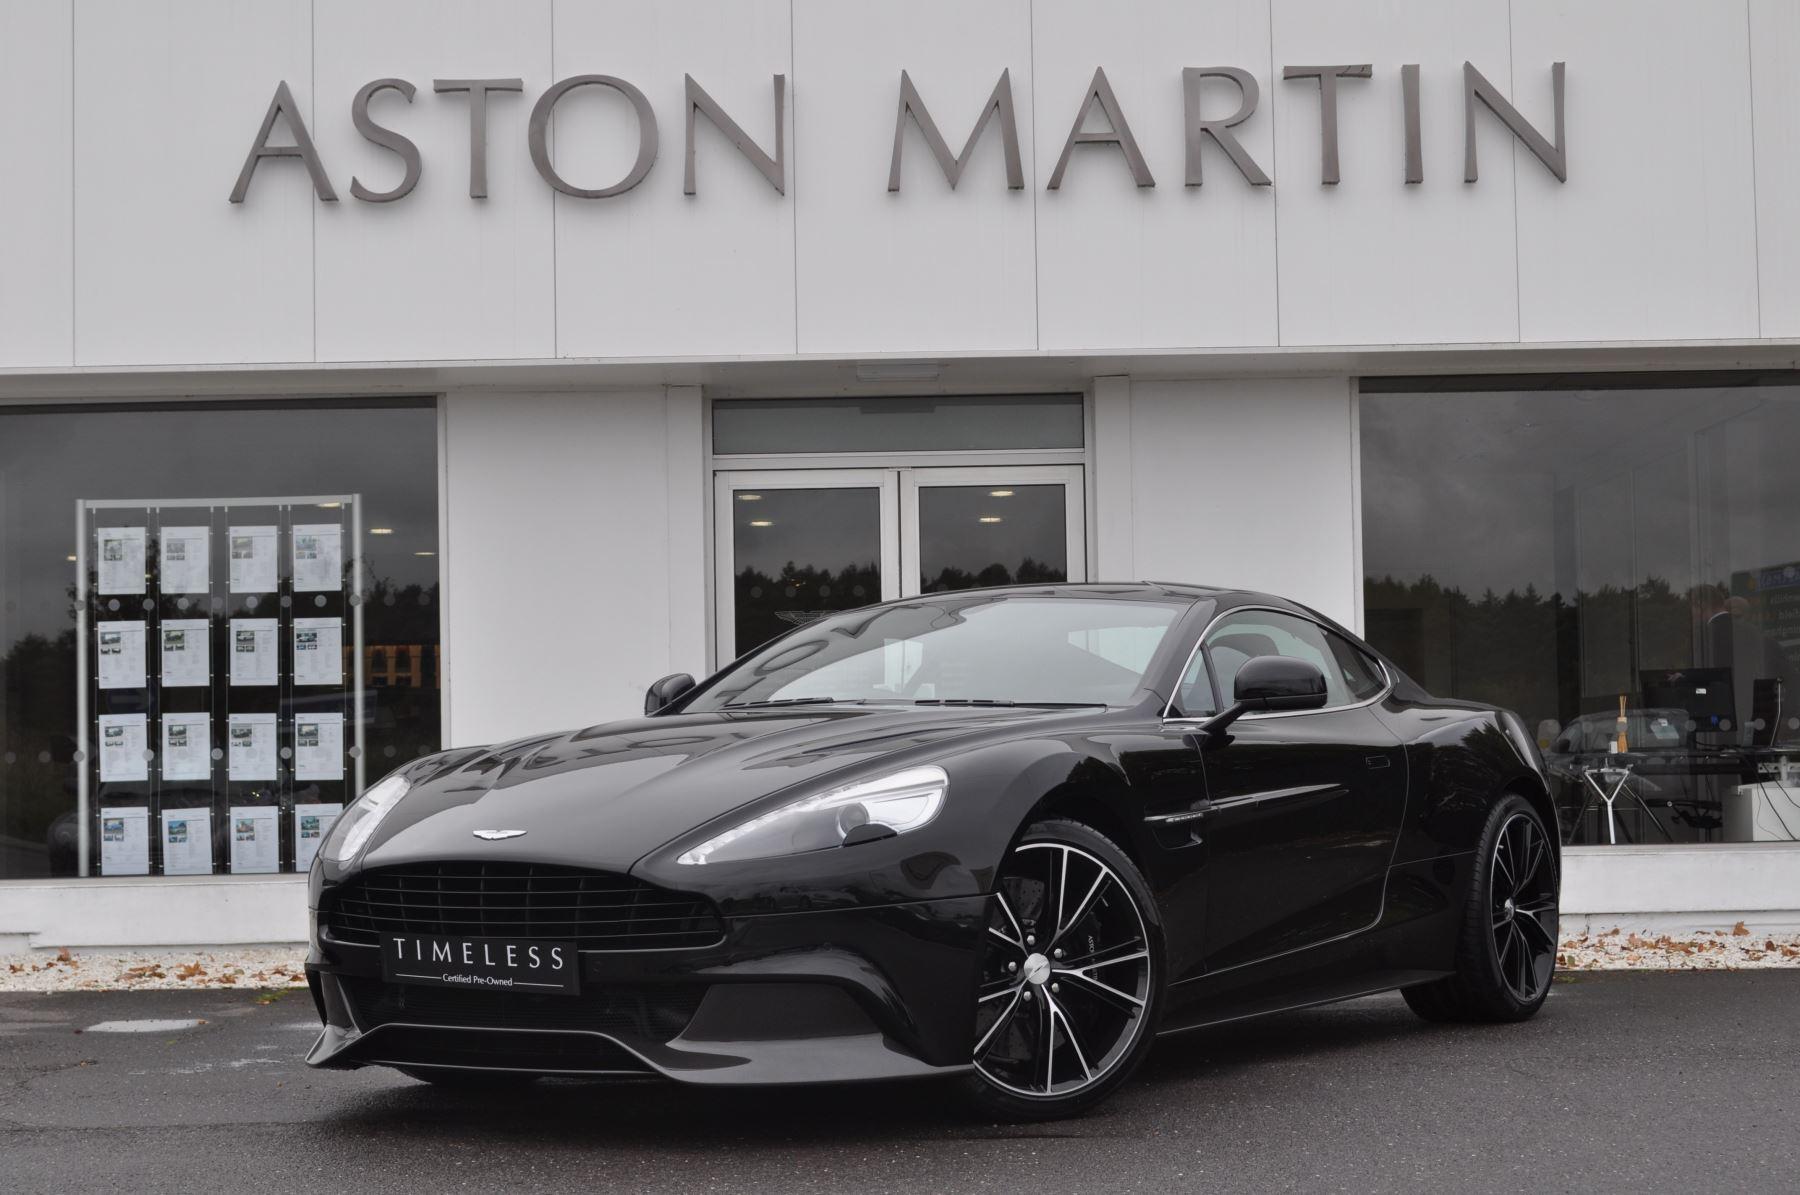 Aston Martin Vanquish V12 [568] 2+2 2dr Touchtronic 5.9 Automatic Coupe (2015) image